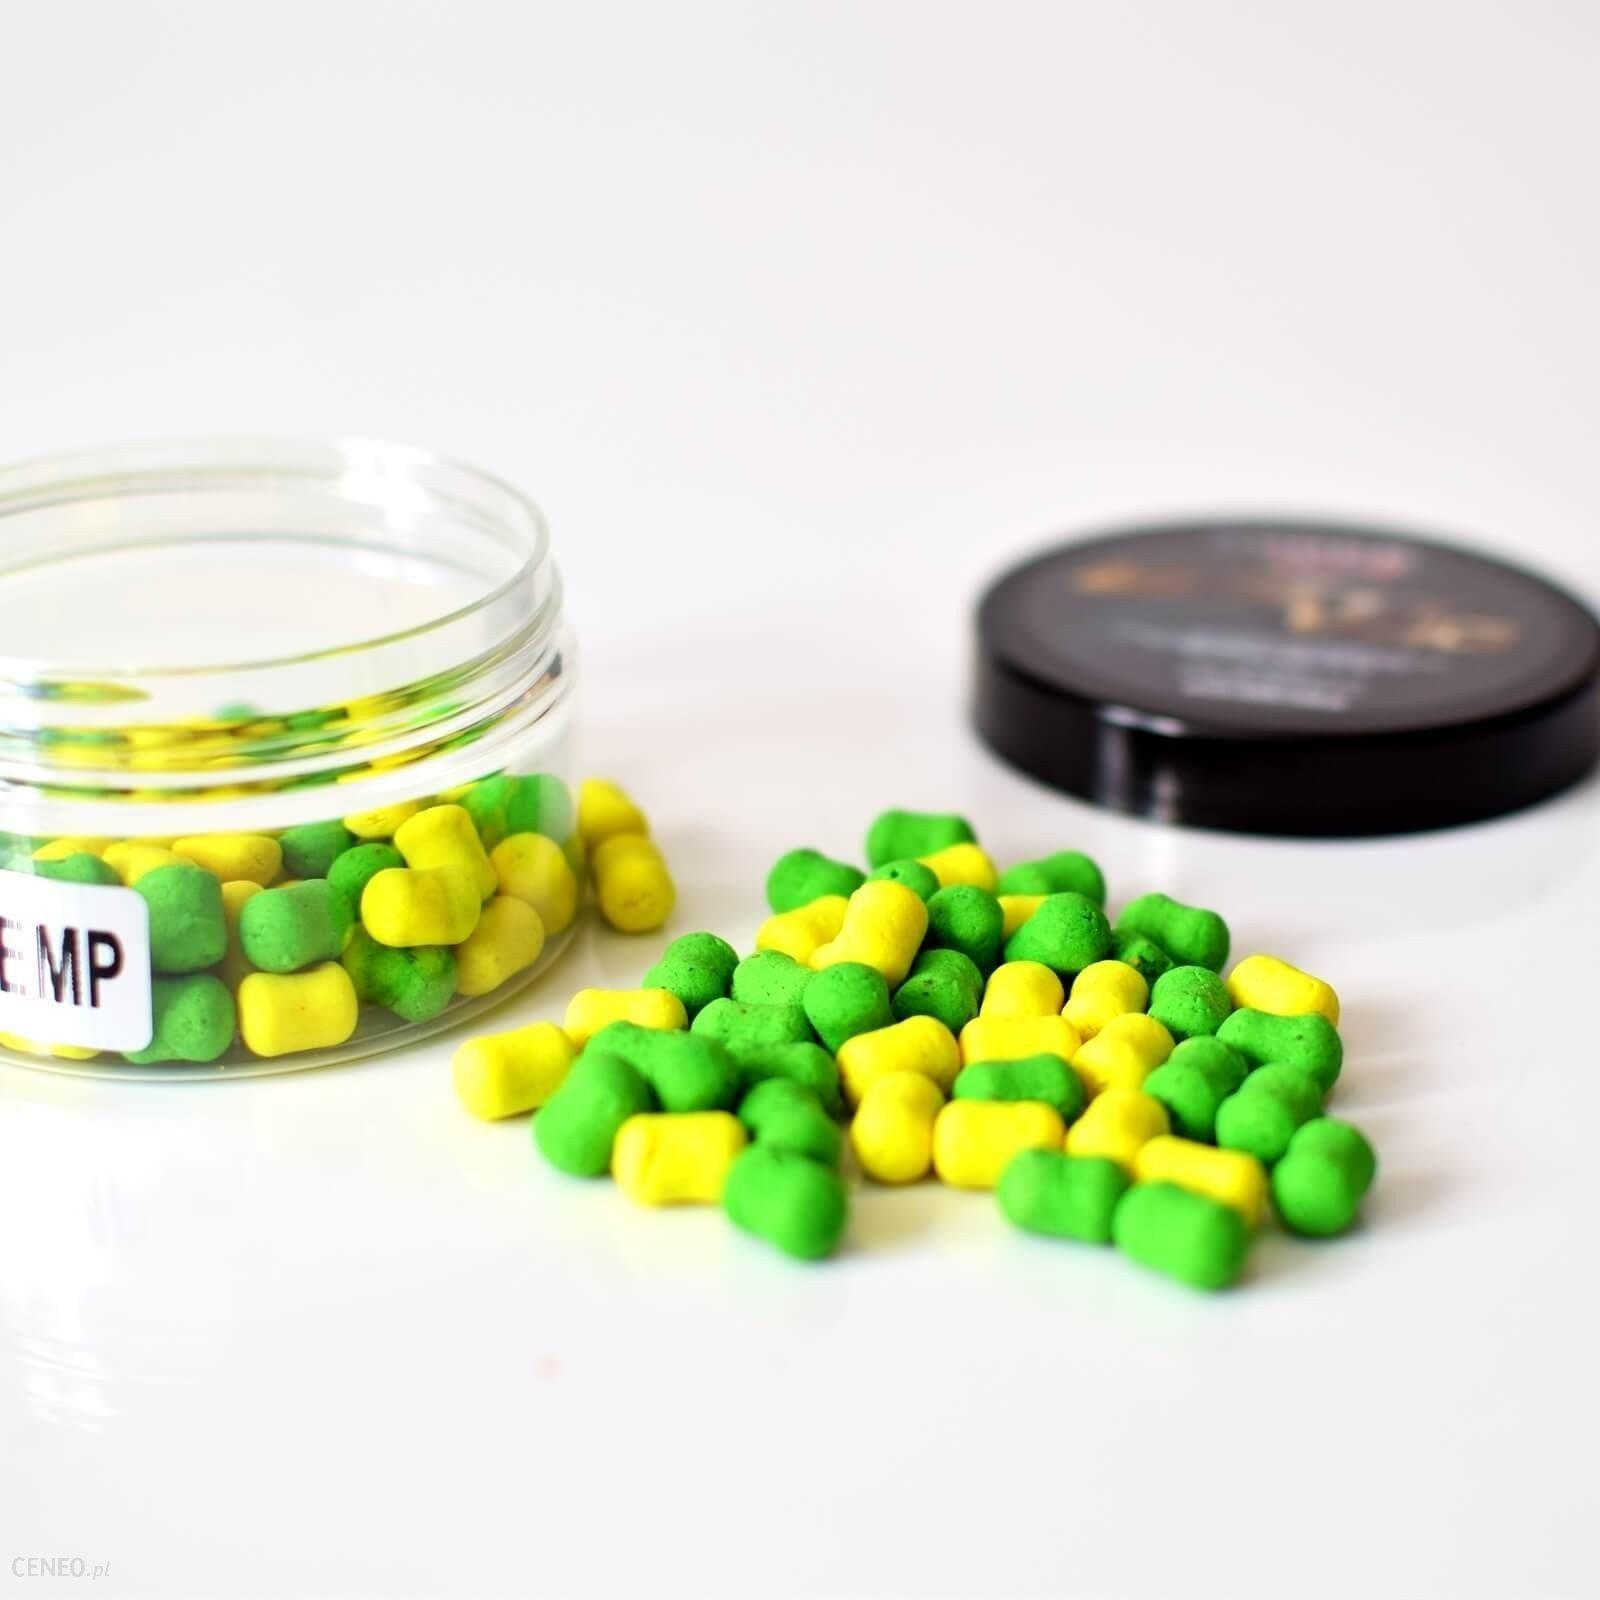 Adder Carp Dumbells Vbg Haczykowy Hemp&Corn 8 10Mm Mix